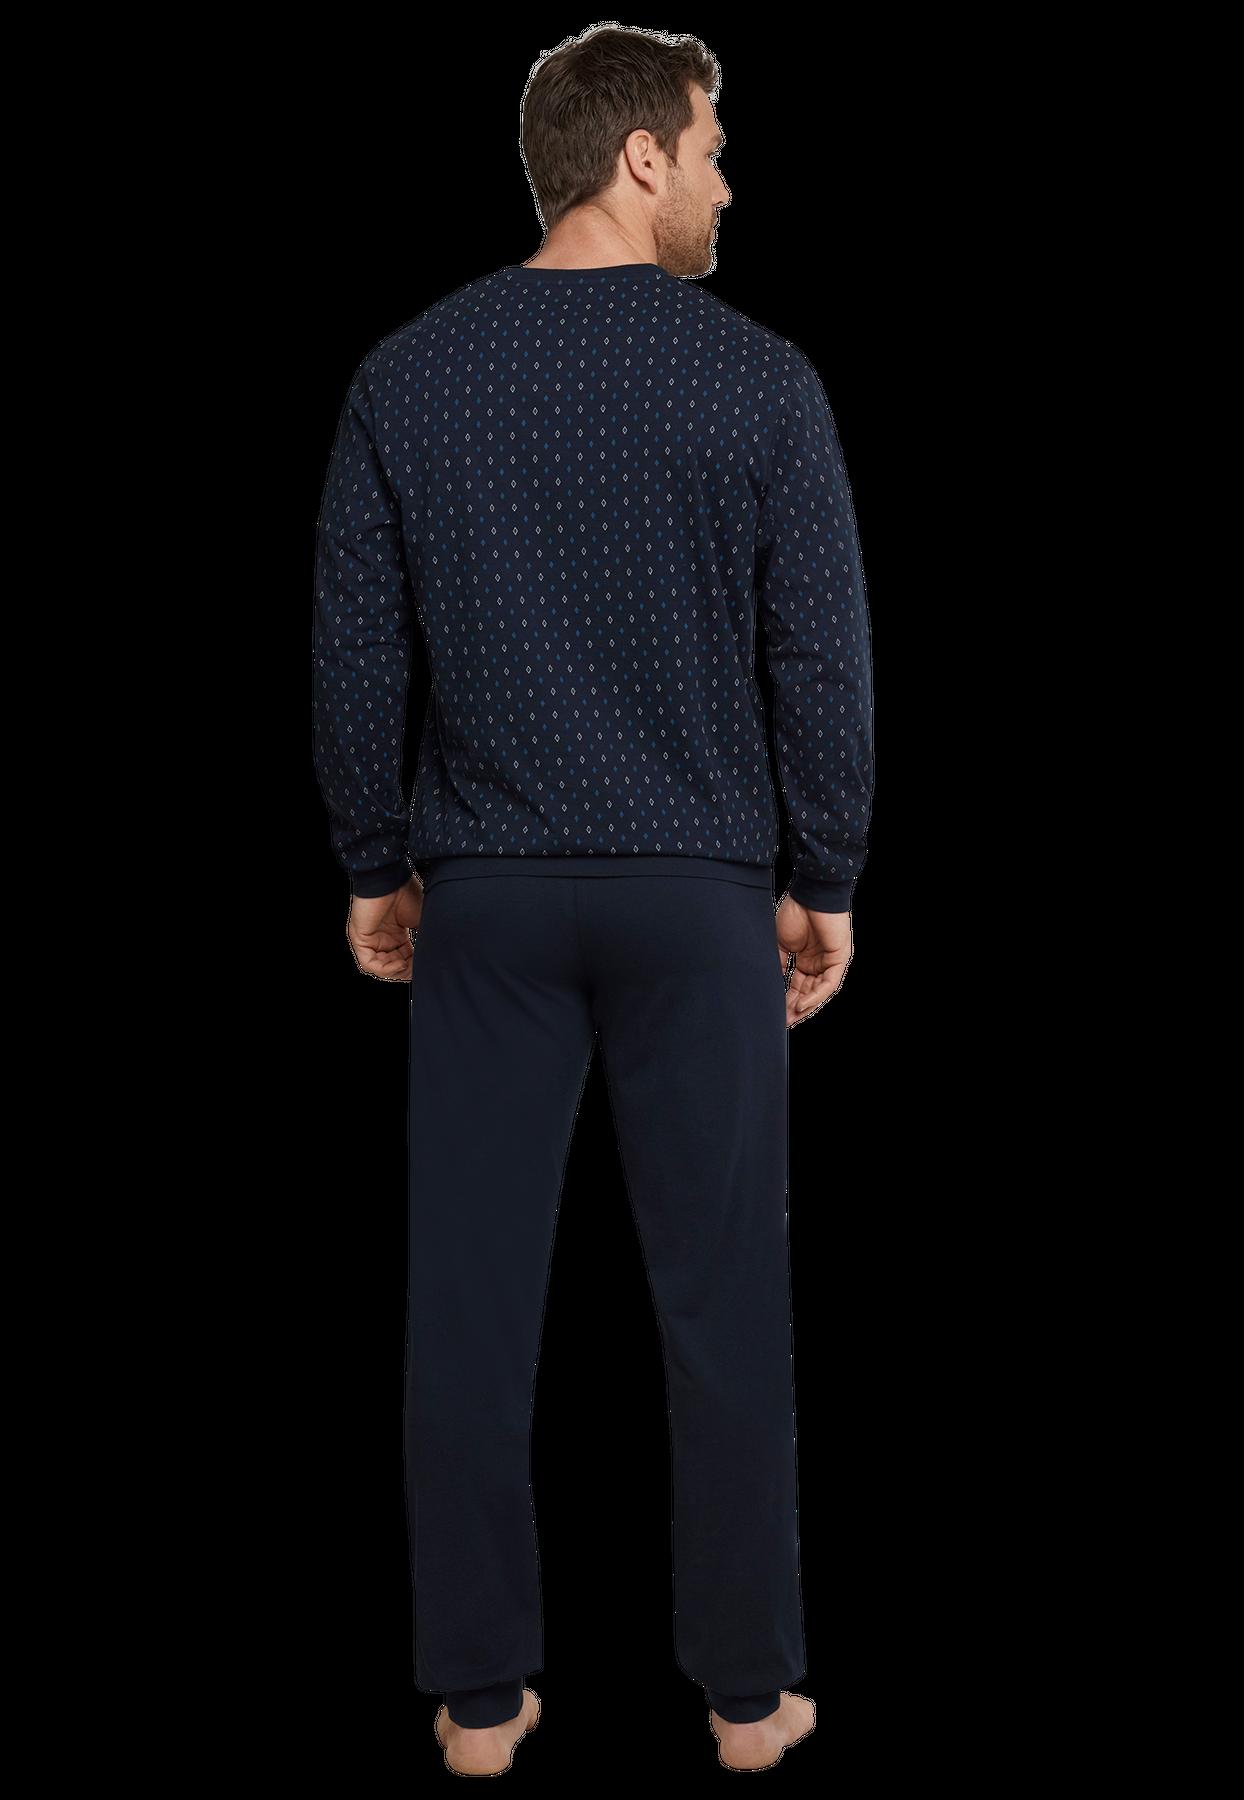 Seidensticker - Herren Pyjama lang, dunkelblau (159000) – Bild 2